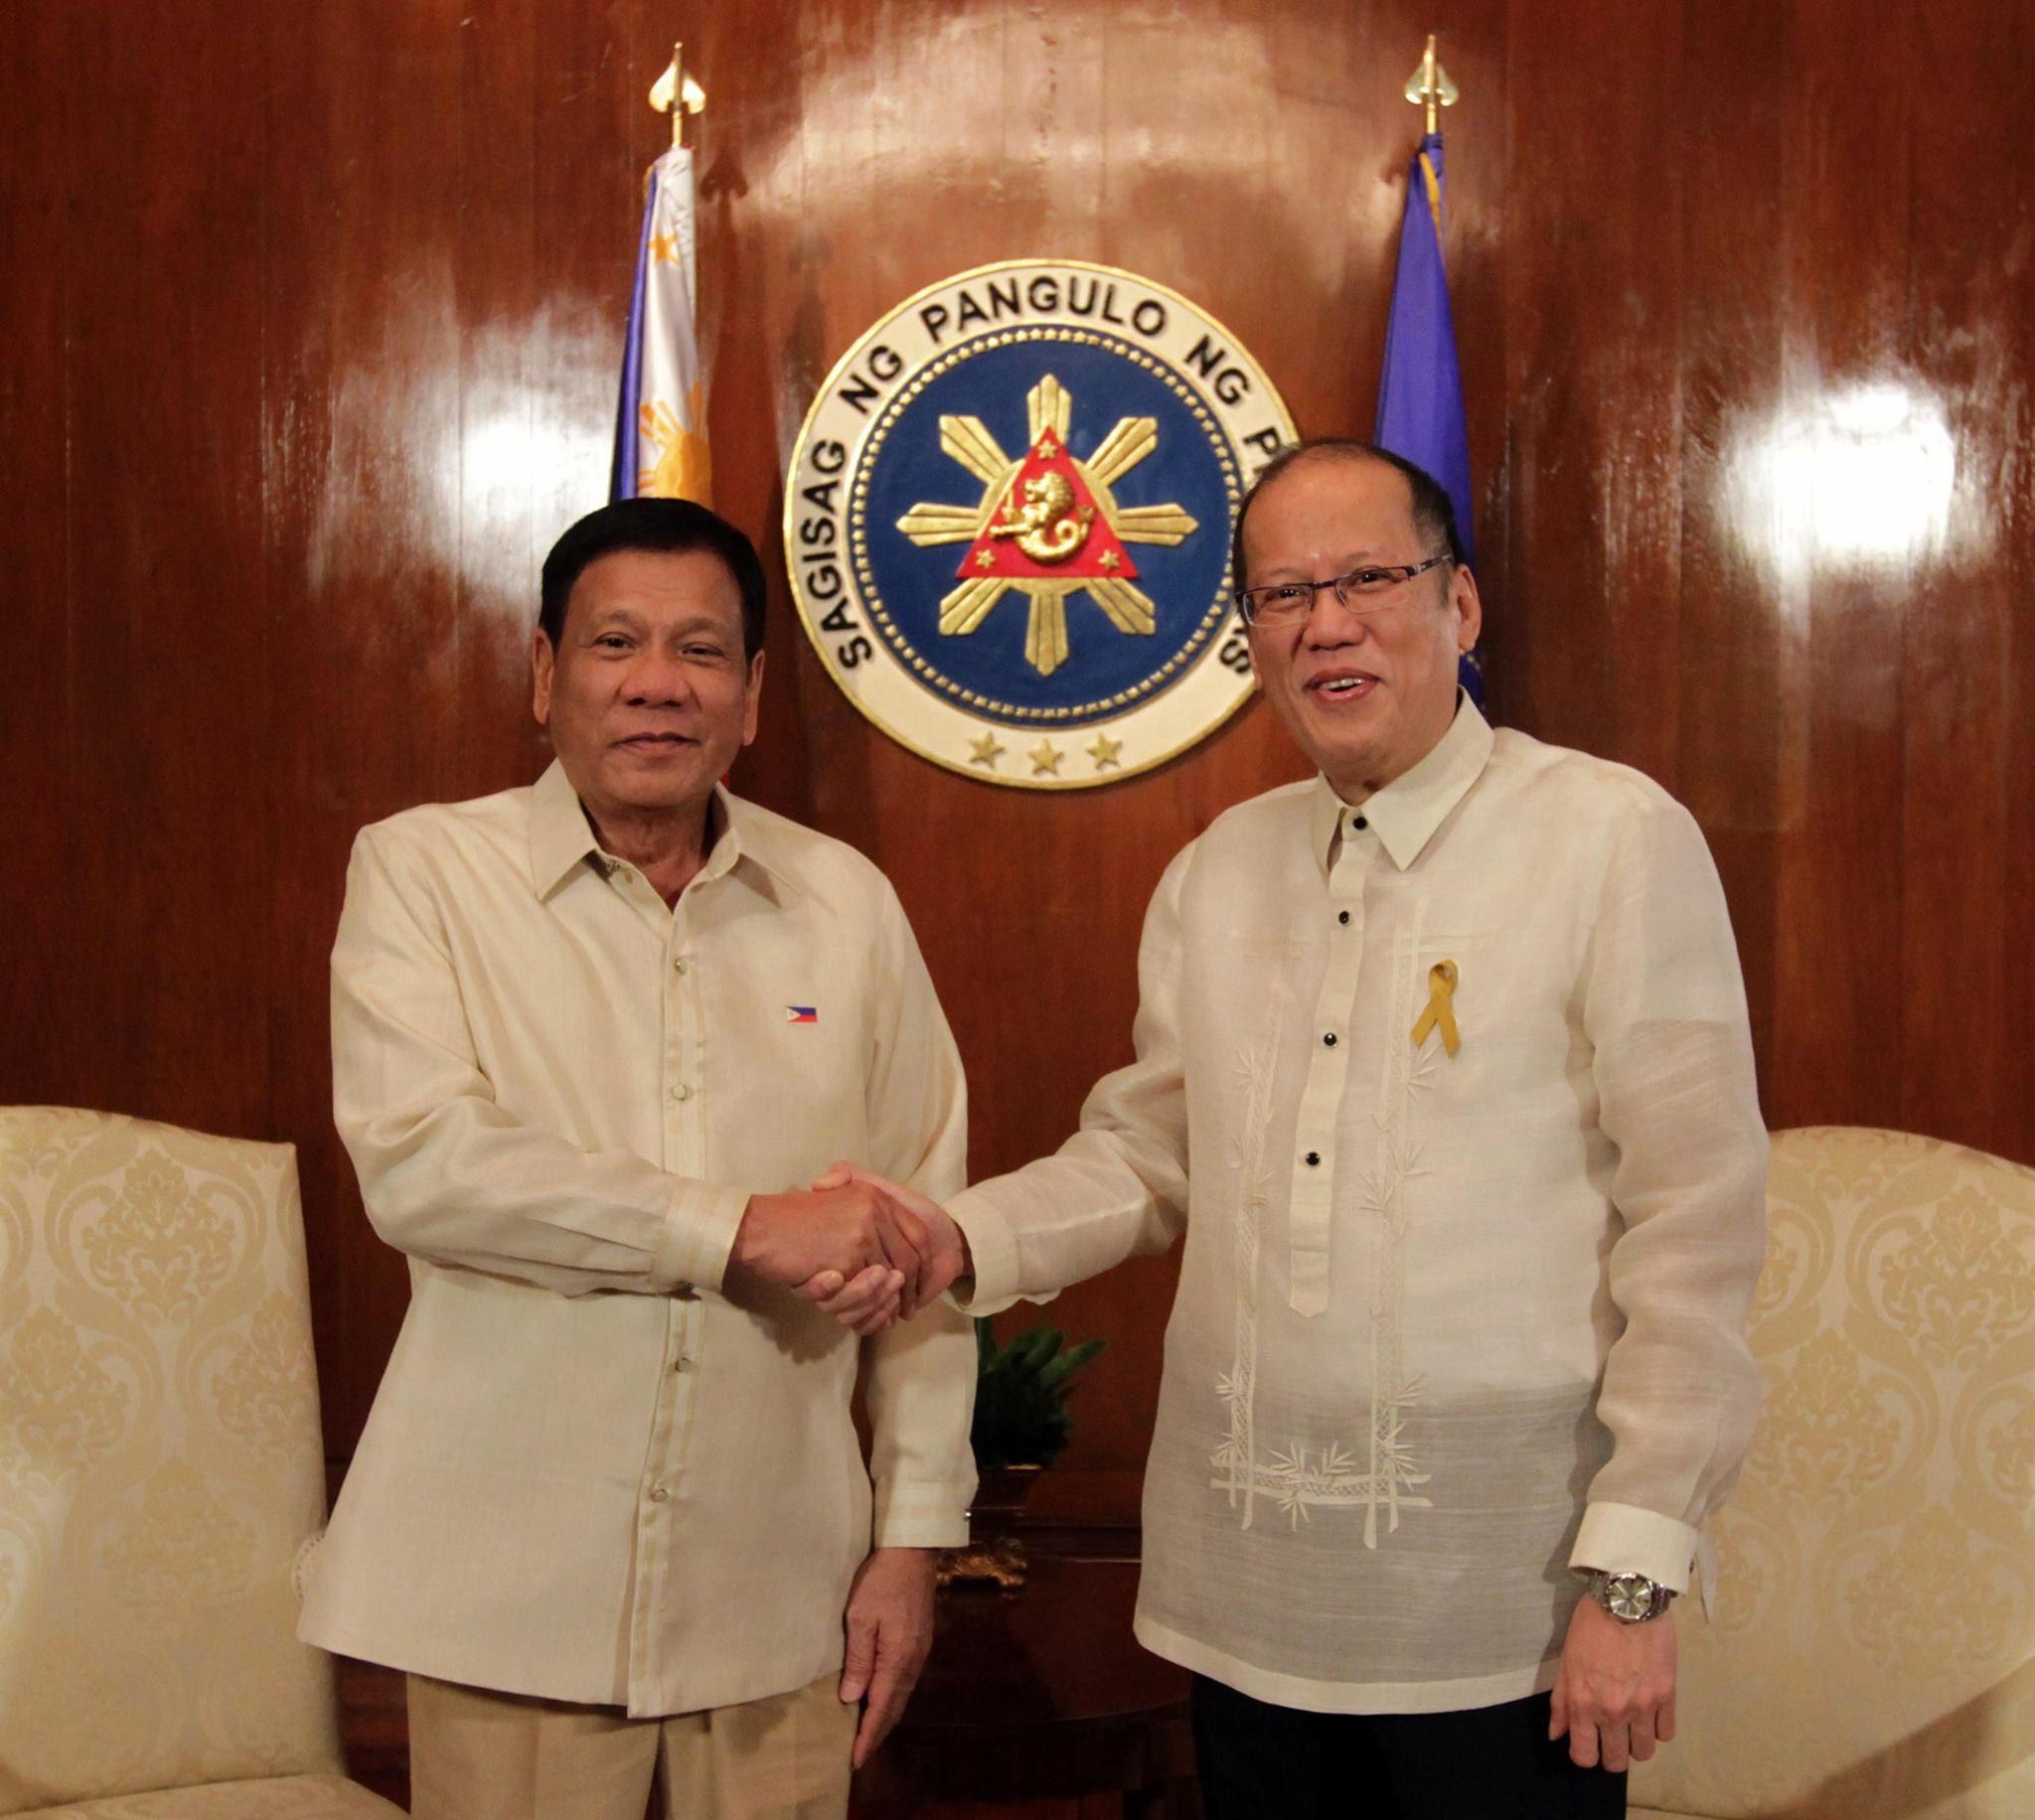 Pin By Gimini On Duterte All The Way Rodrigo Duterte President Of The Philippines Current President